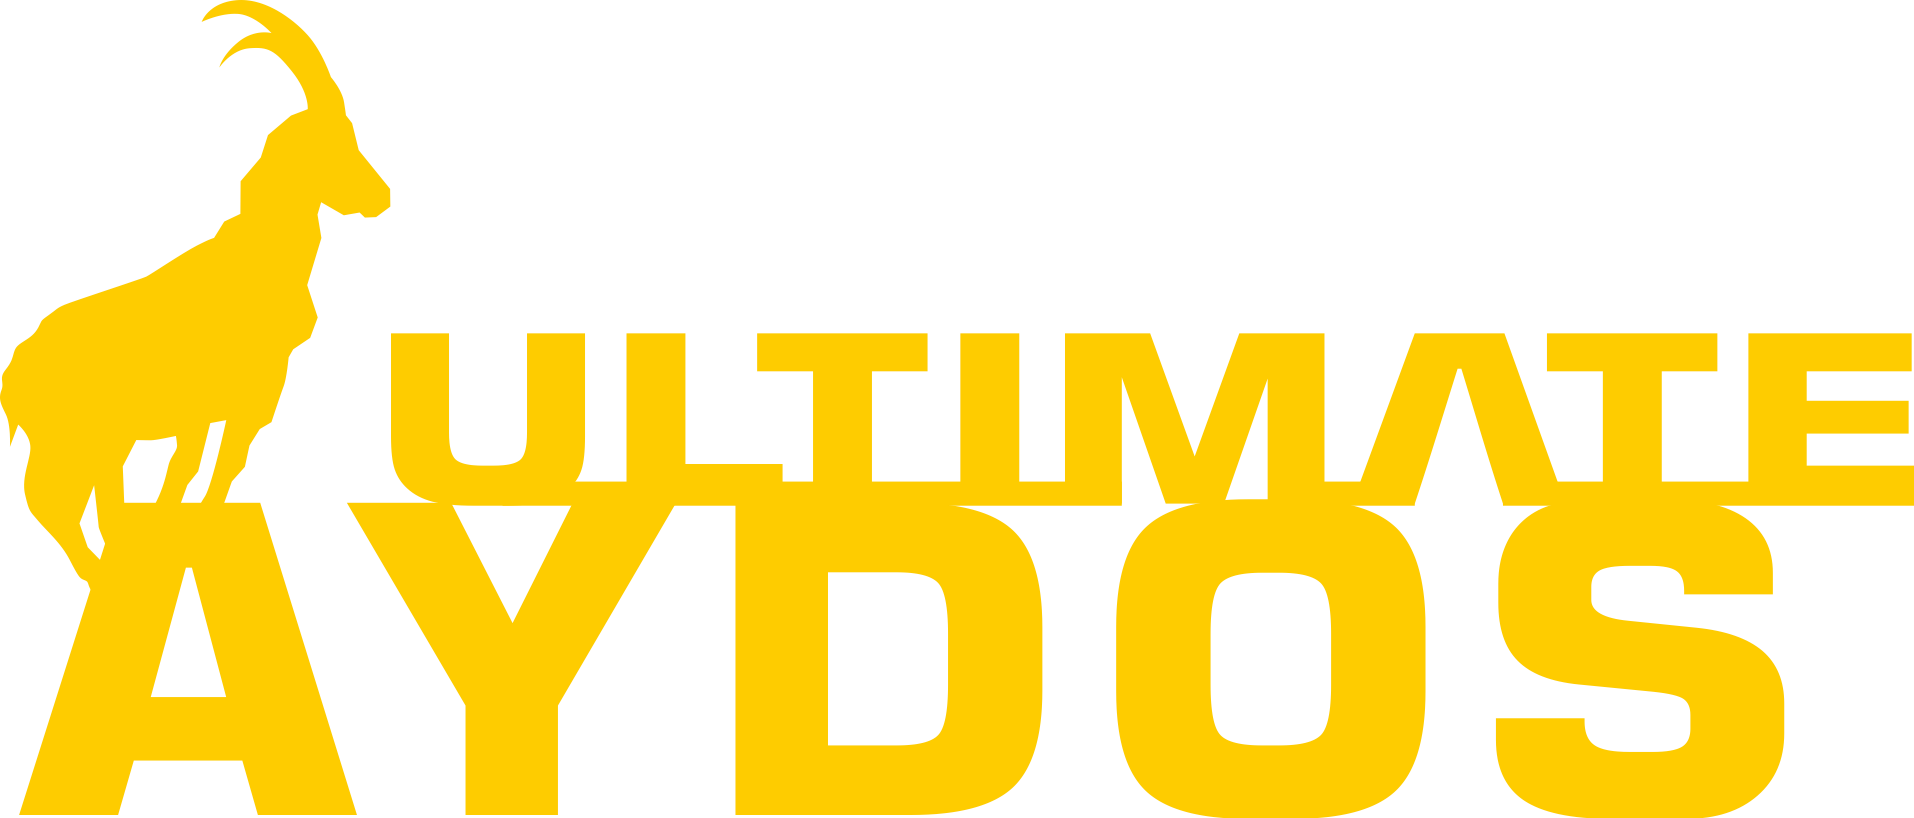 http://teamkronos.com/wp-content/uploads/2021/01/sarı-ultimate-aydos.png